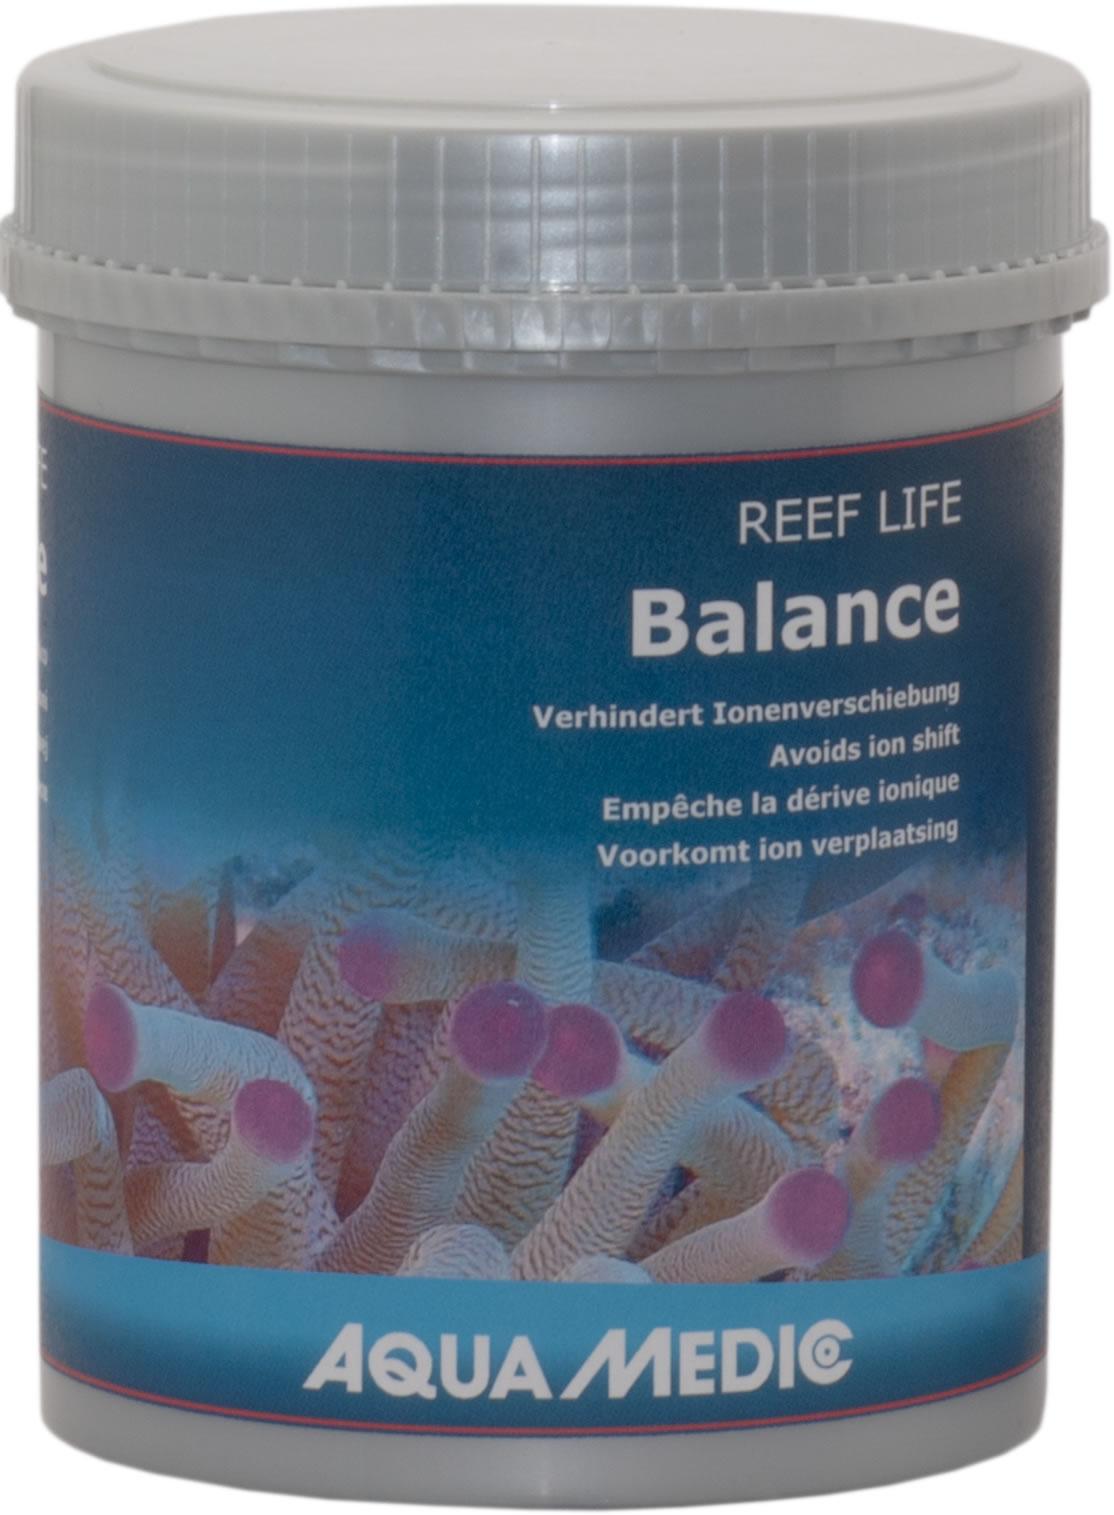 Aqua Medic REEF LIFE Balance